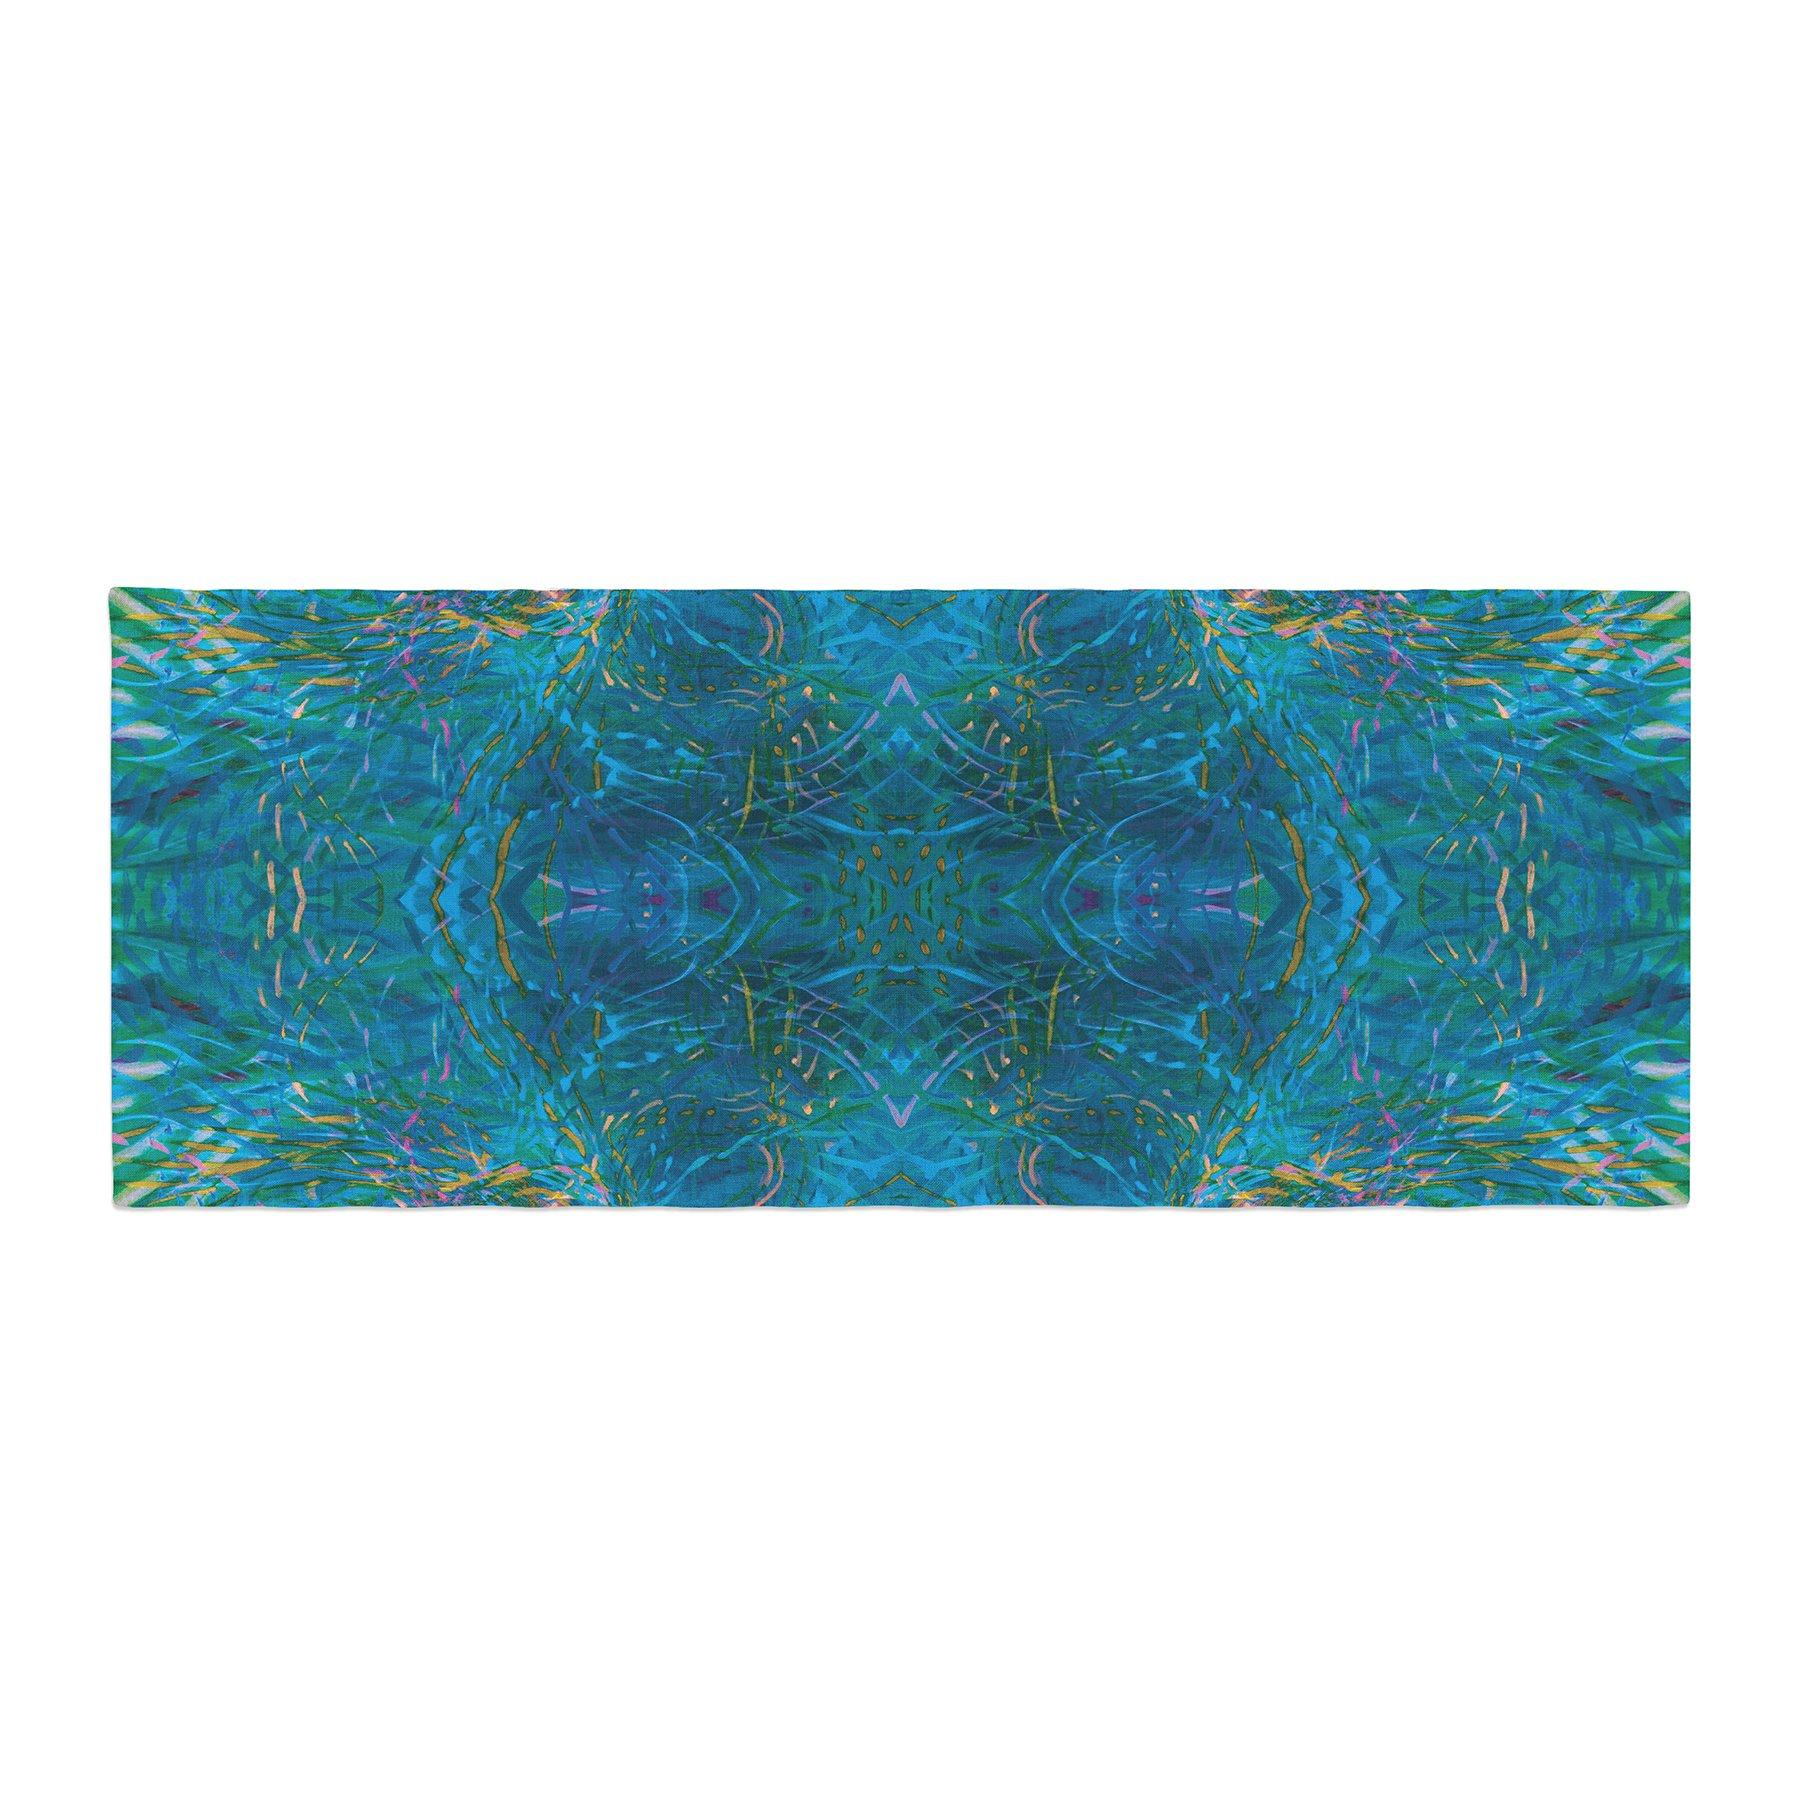 Kess InHouse Nikposium Clearwater Blue Teal Bed Runner, 34'' x 86''